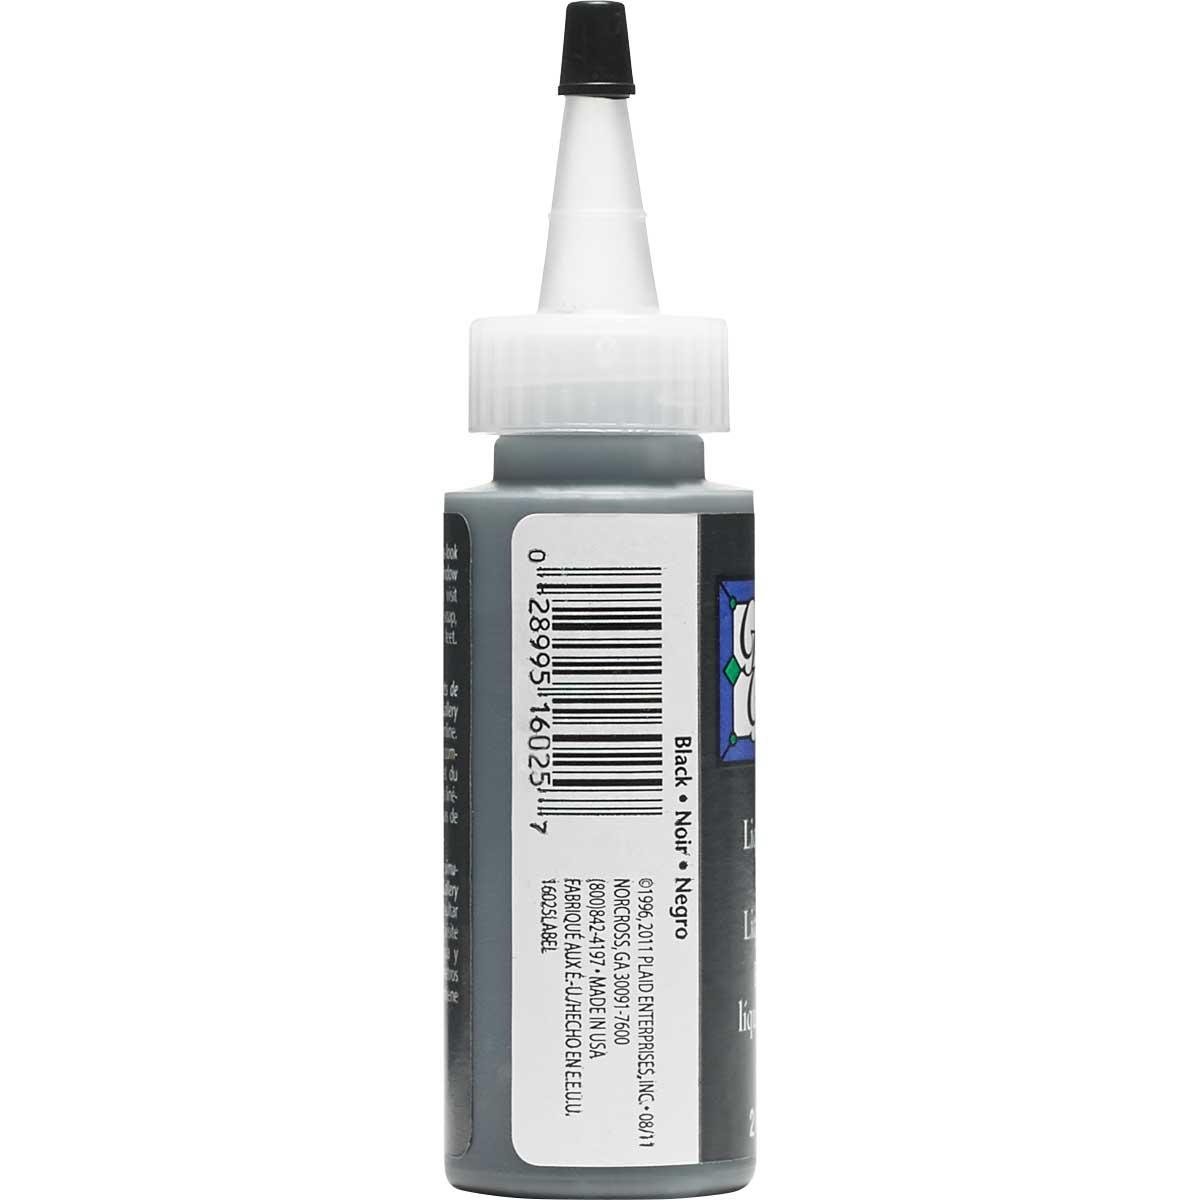 Gallery Glass ® Liquid Leading™ - Black, 2 oz.